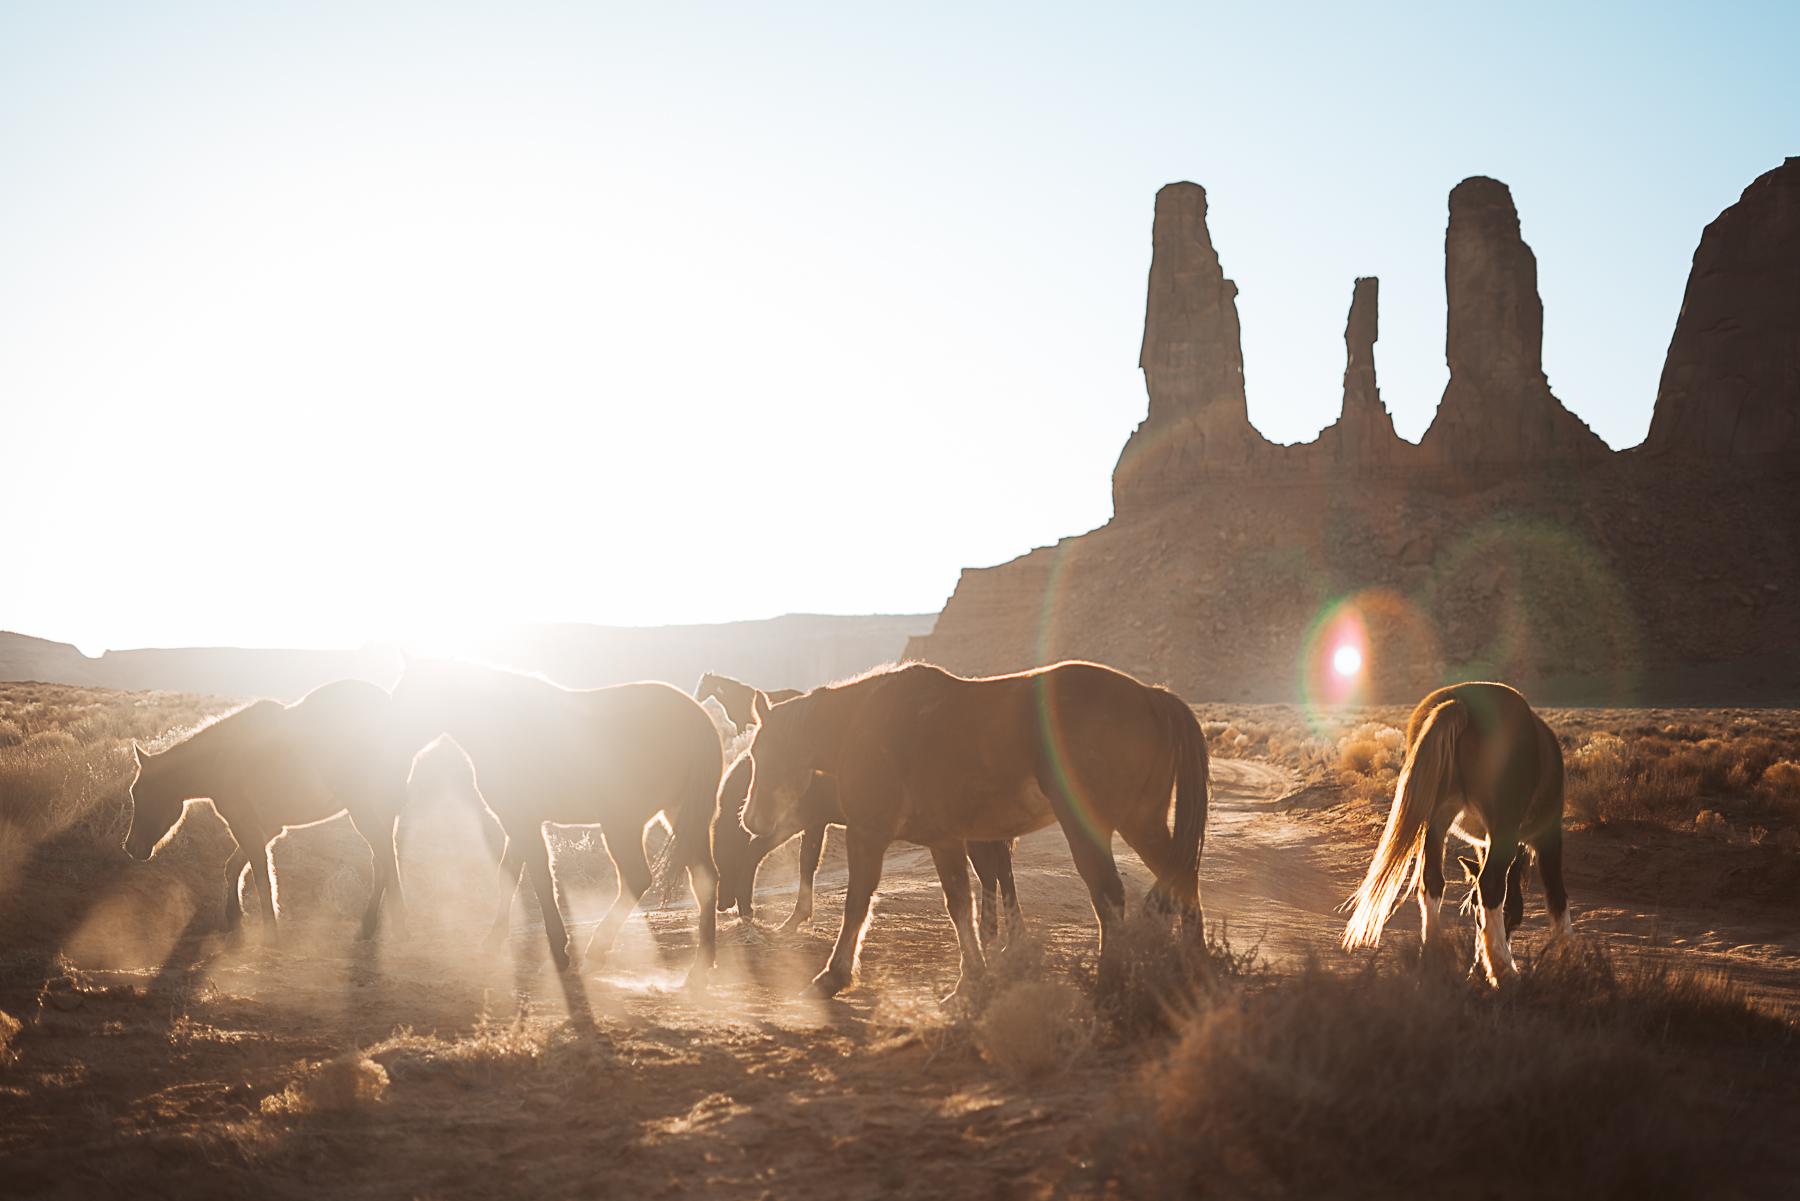 Wildhorse13.jpg